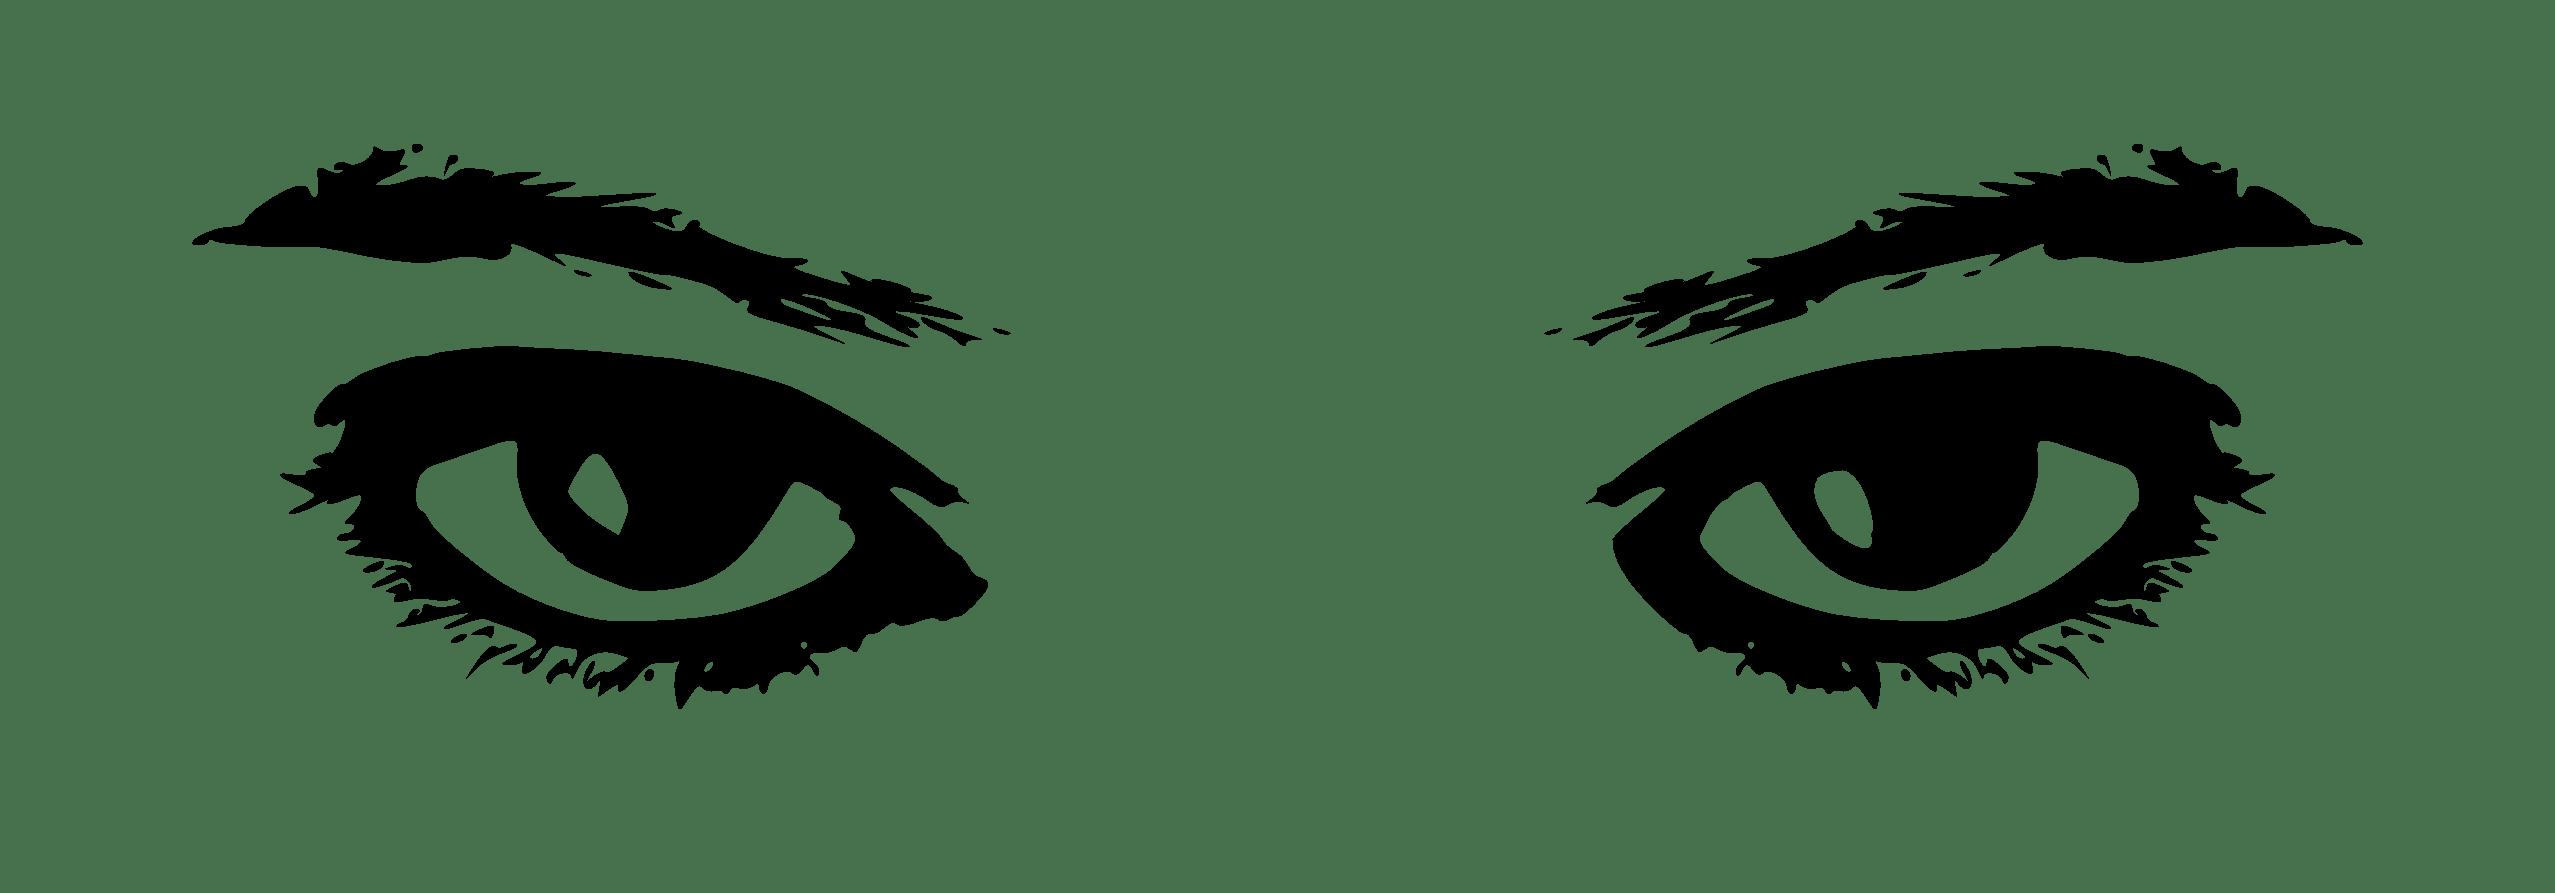 Two eyes hd wallpaper. Eye clipart black and white